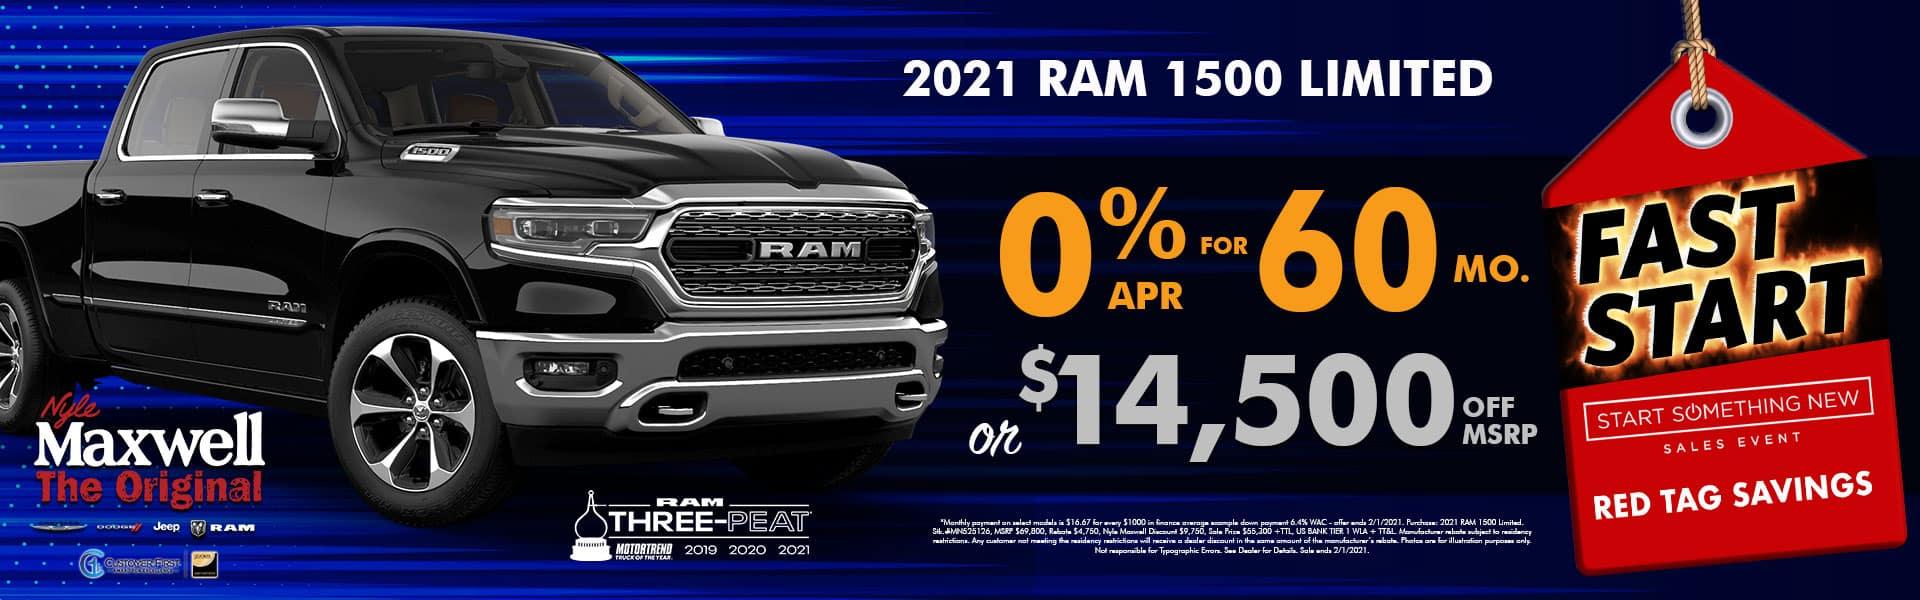 NMT Graphic – Web Banner (1920×600) – Fast Start – RAM 1500 LTD – 01.2021